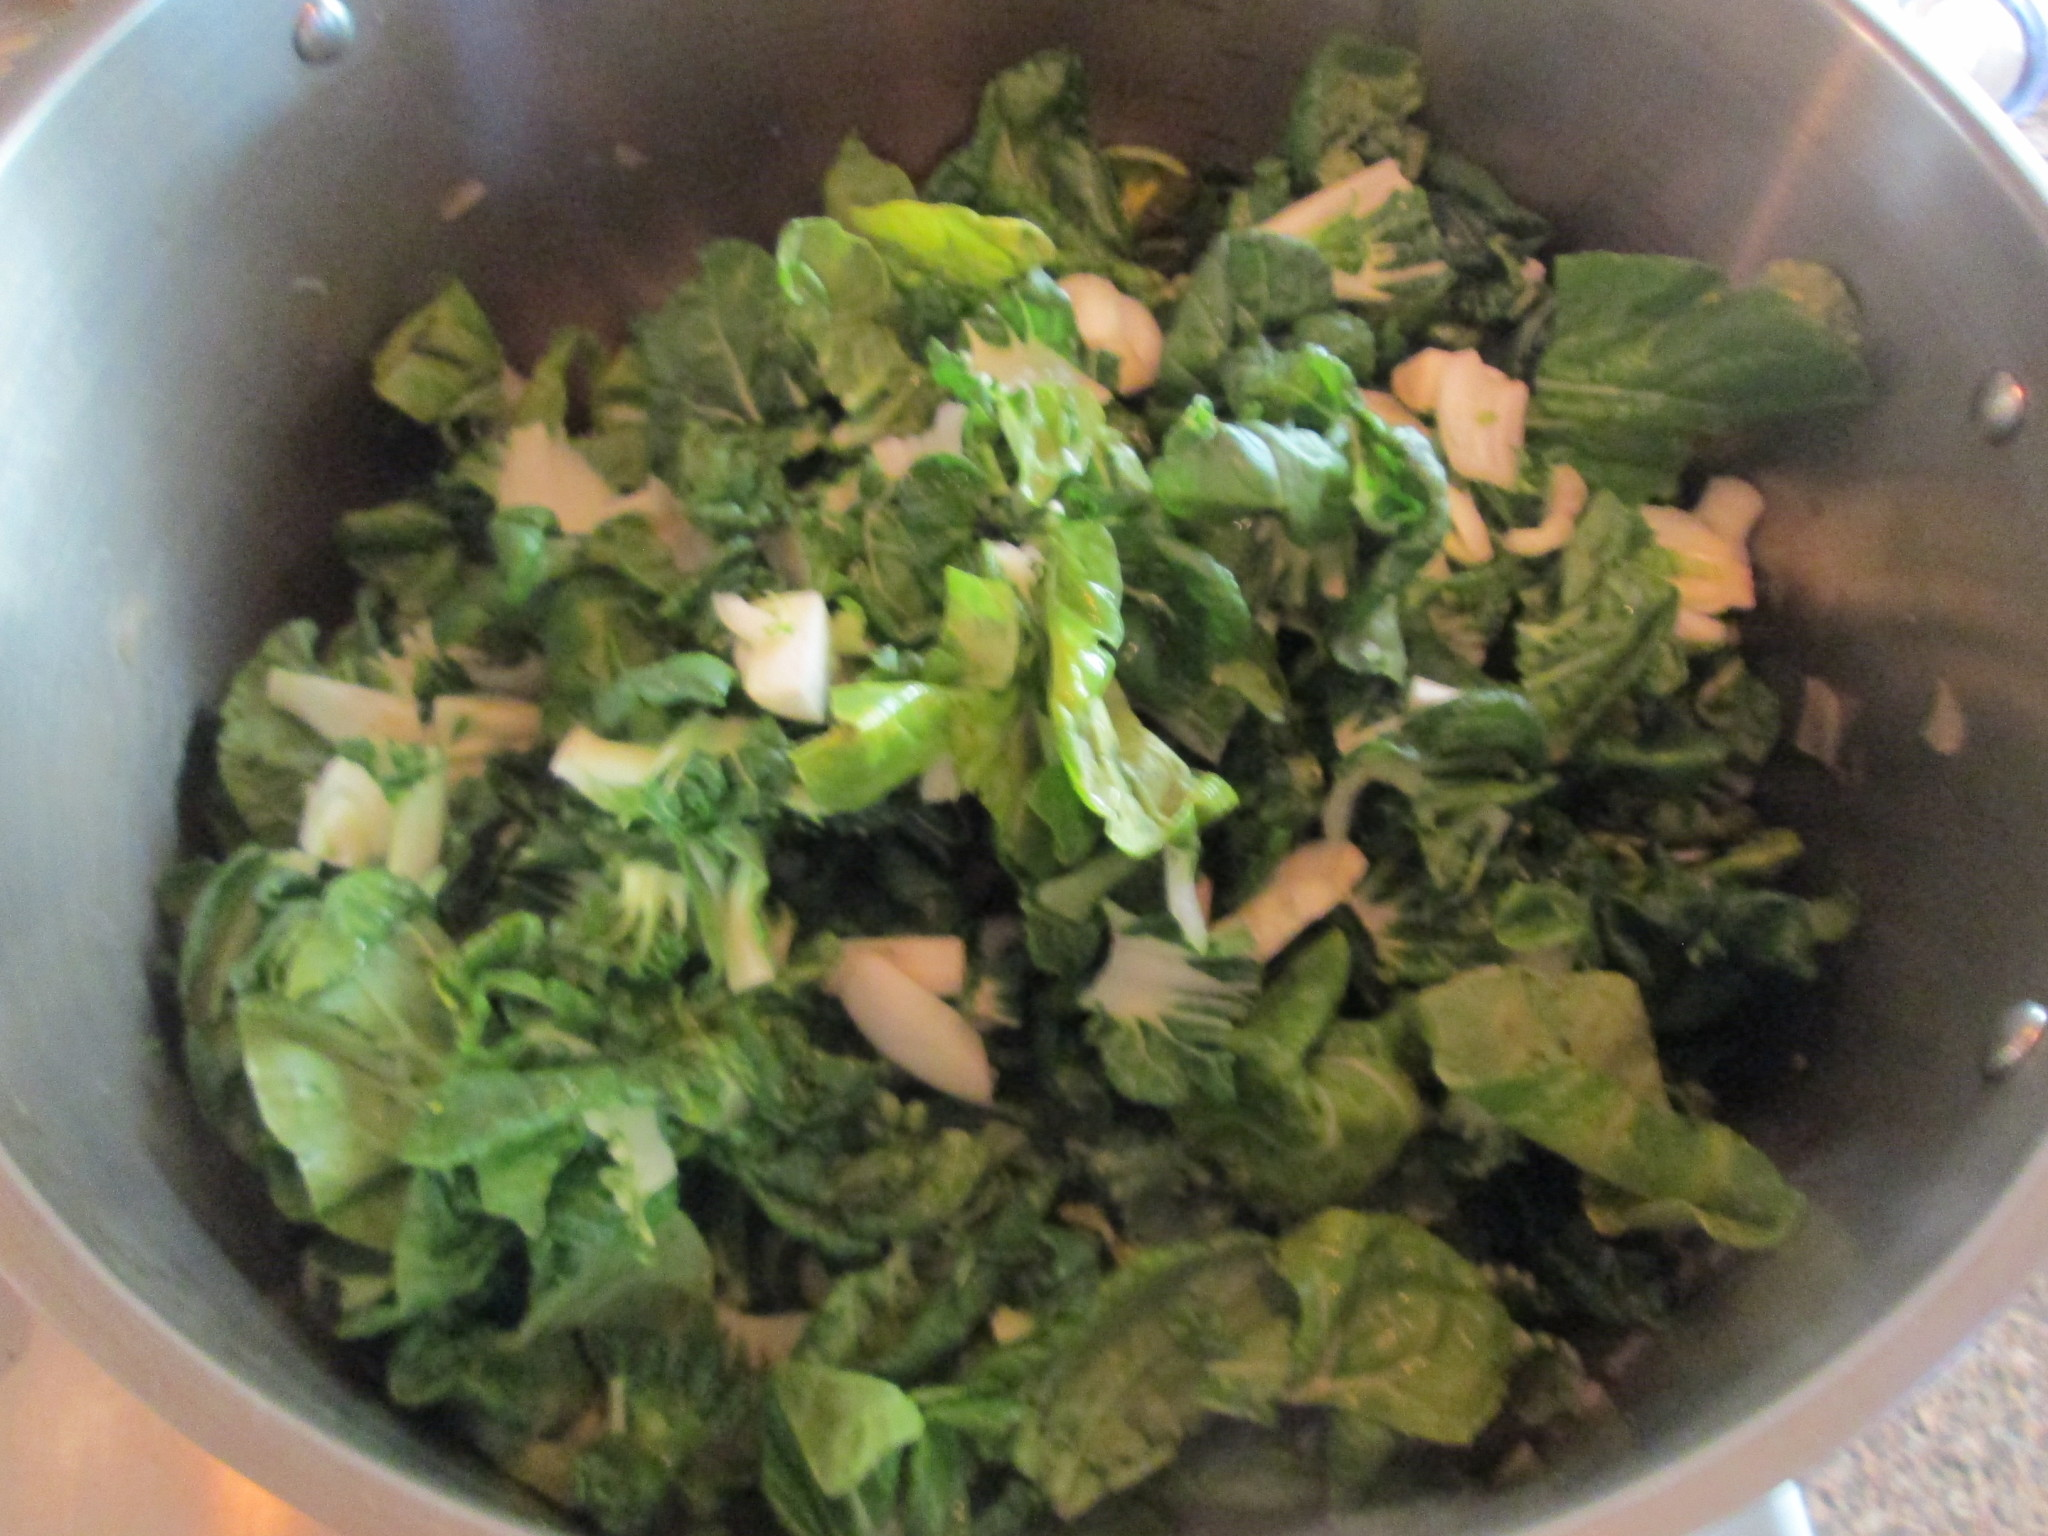 Zucchini Eggplant Green Curry Recipe with Quinoa - 6 bok choy in pot